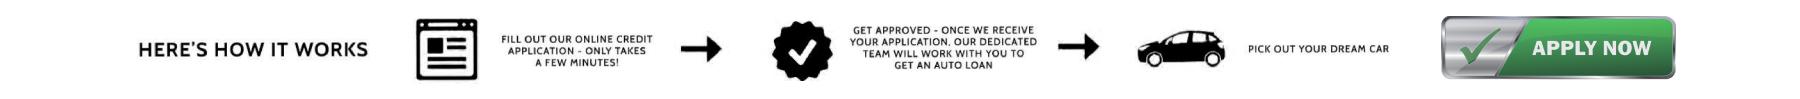 apply for financing desktop